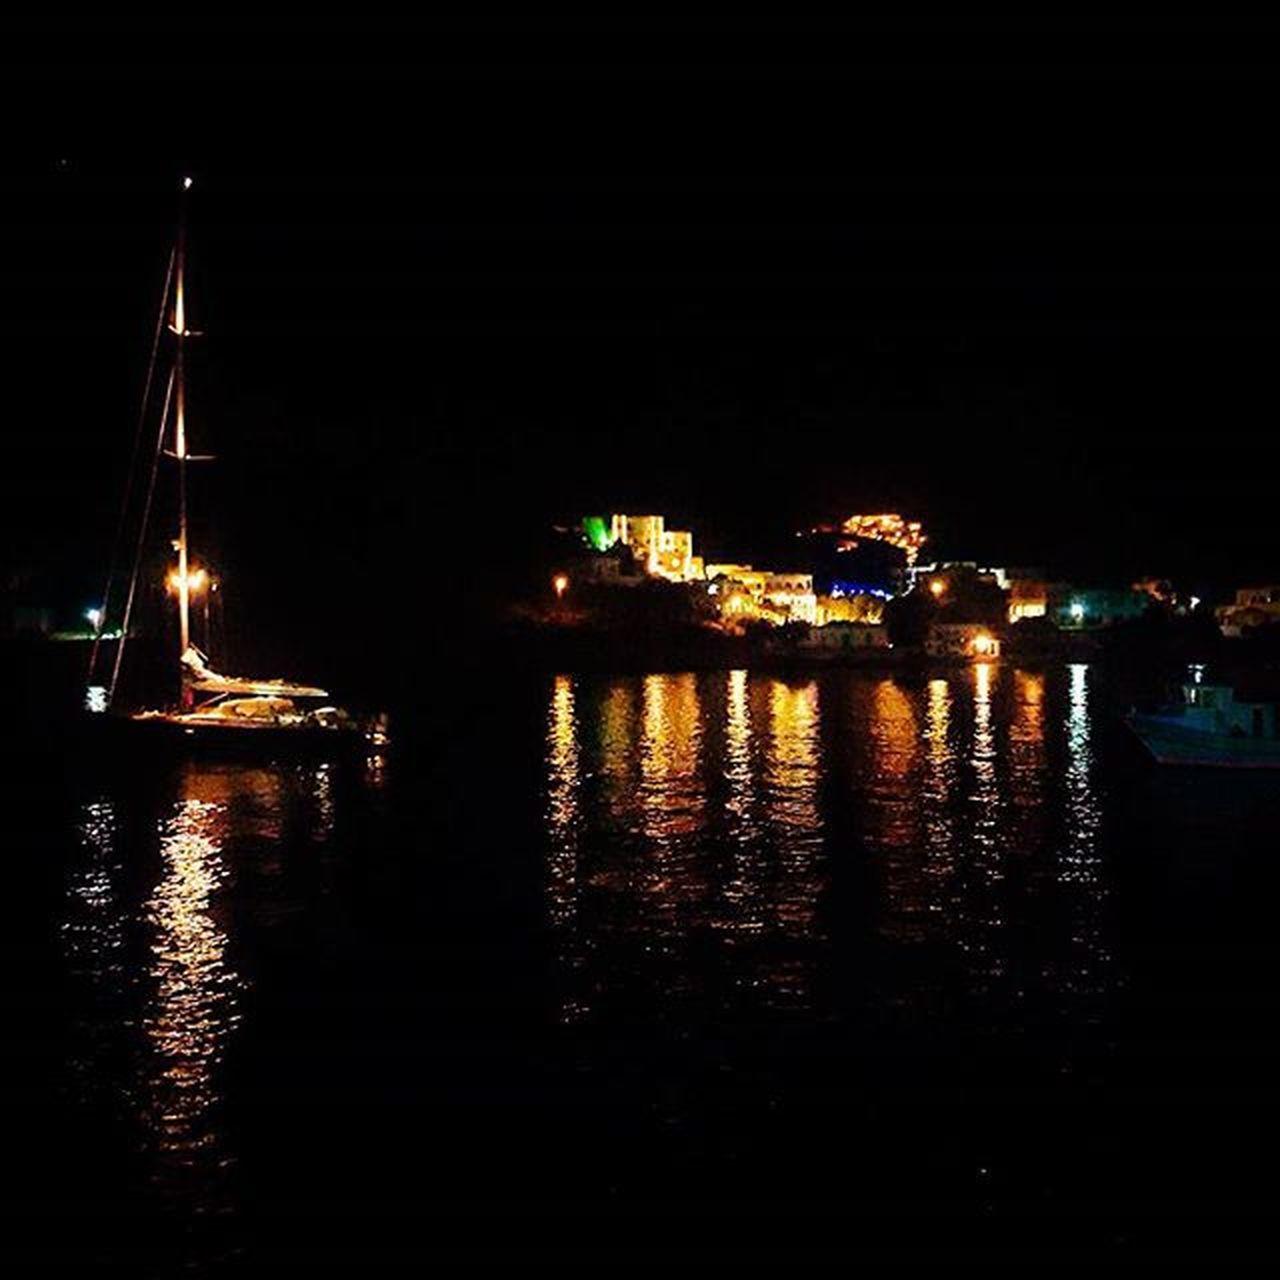 illuminated, night, reflection, nautical vessel, water, no people, transportation, moored, sea, outdoors, city, sky